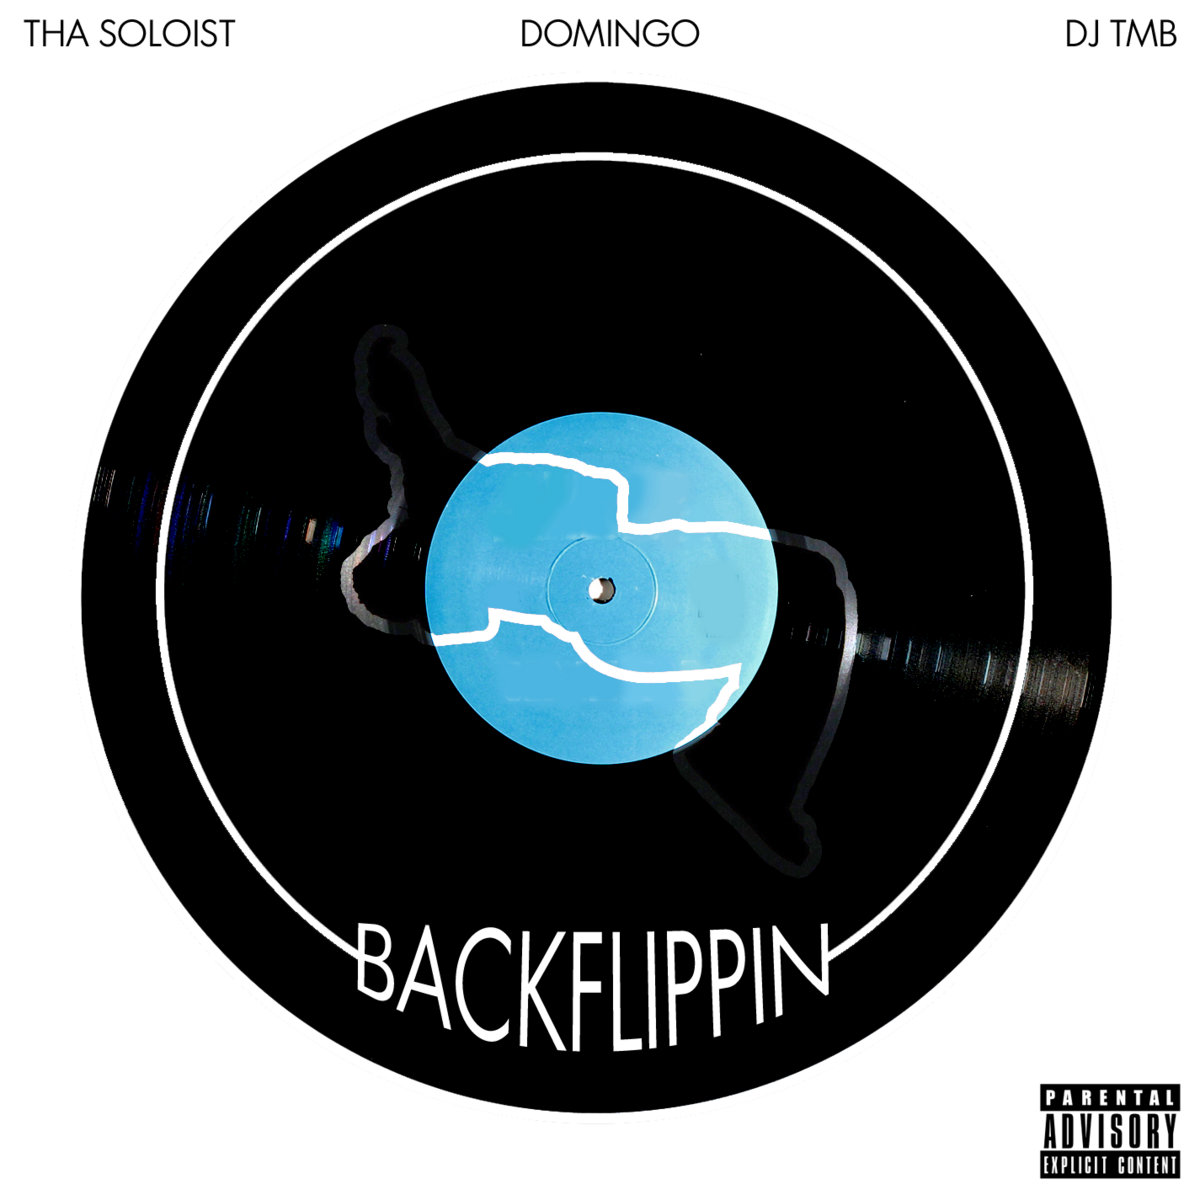 Tha Soloist x Domingo x DJ TMB - Backflippin (EP) | Tha Soloist